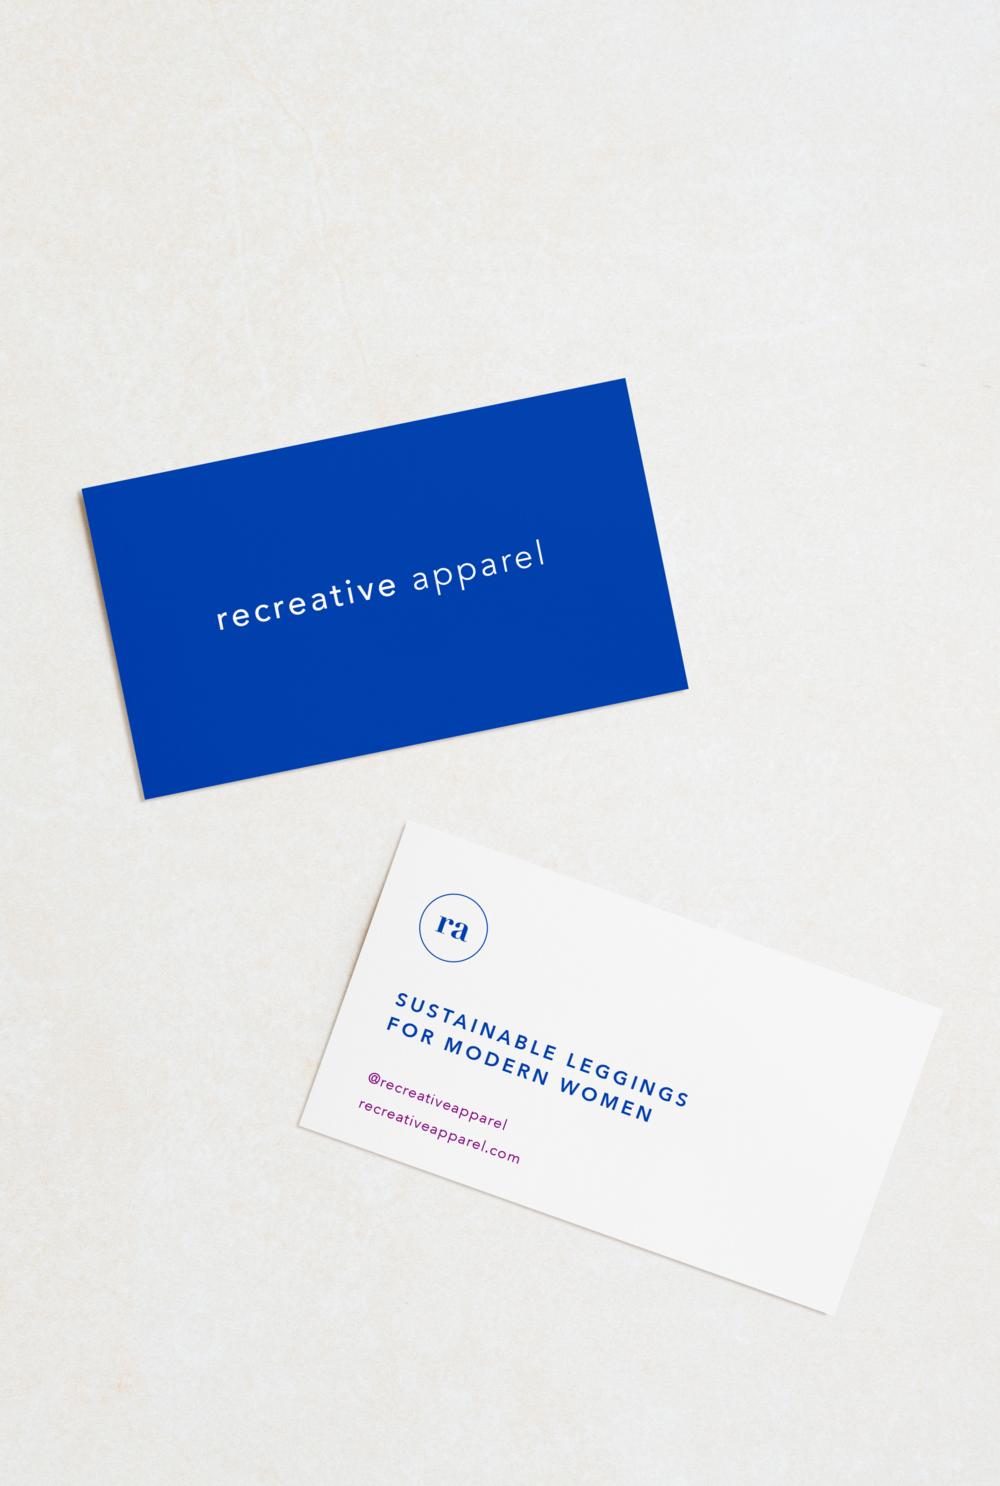 Recreative Apparel Business card design by Salt Design Co.